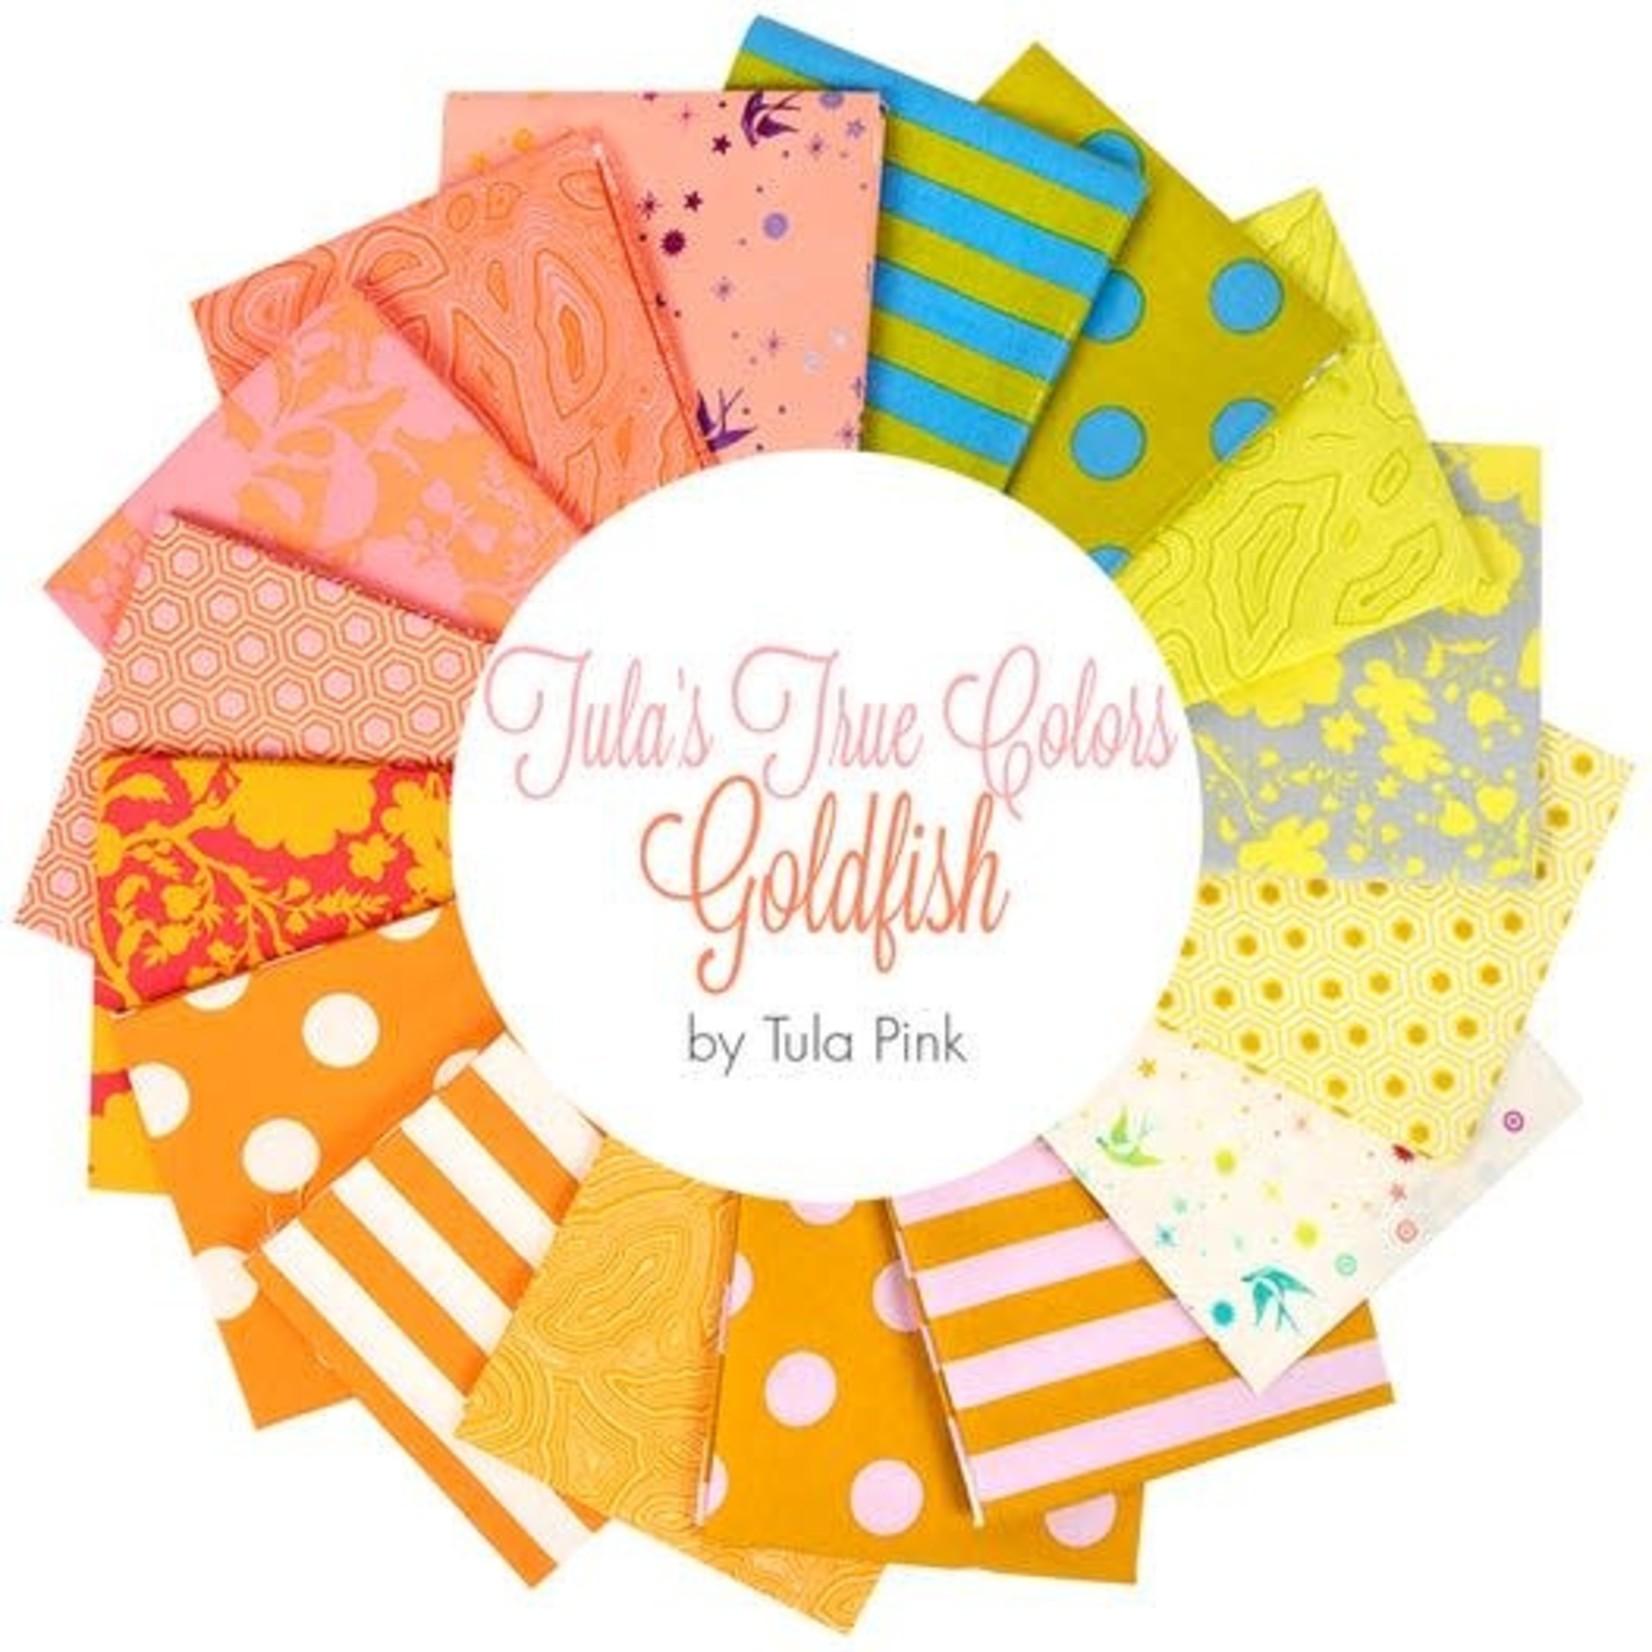 Tula Pink True Colors Fat Quarter Collection - Goldfish